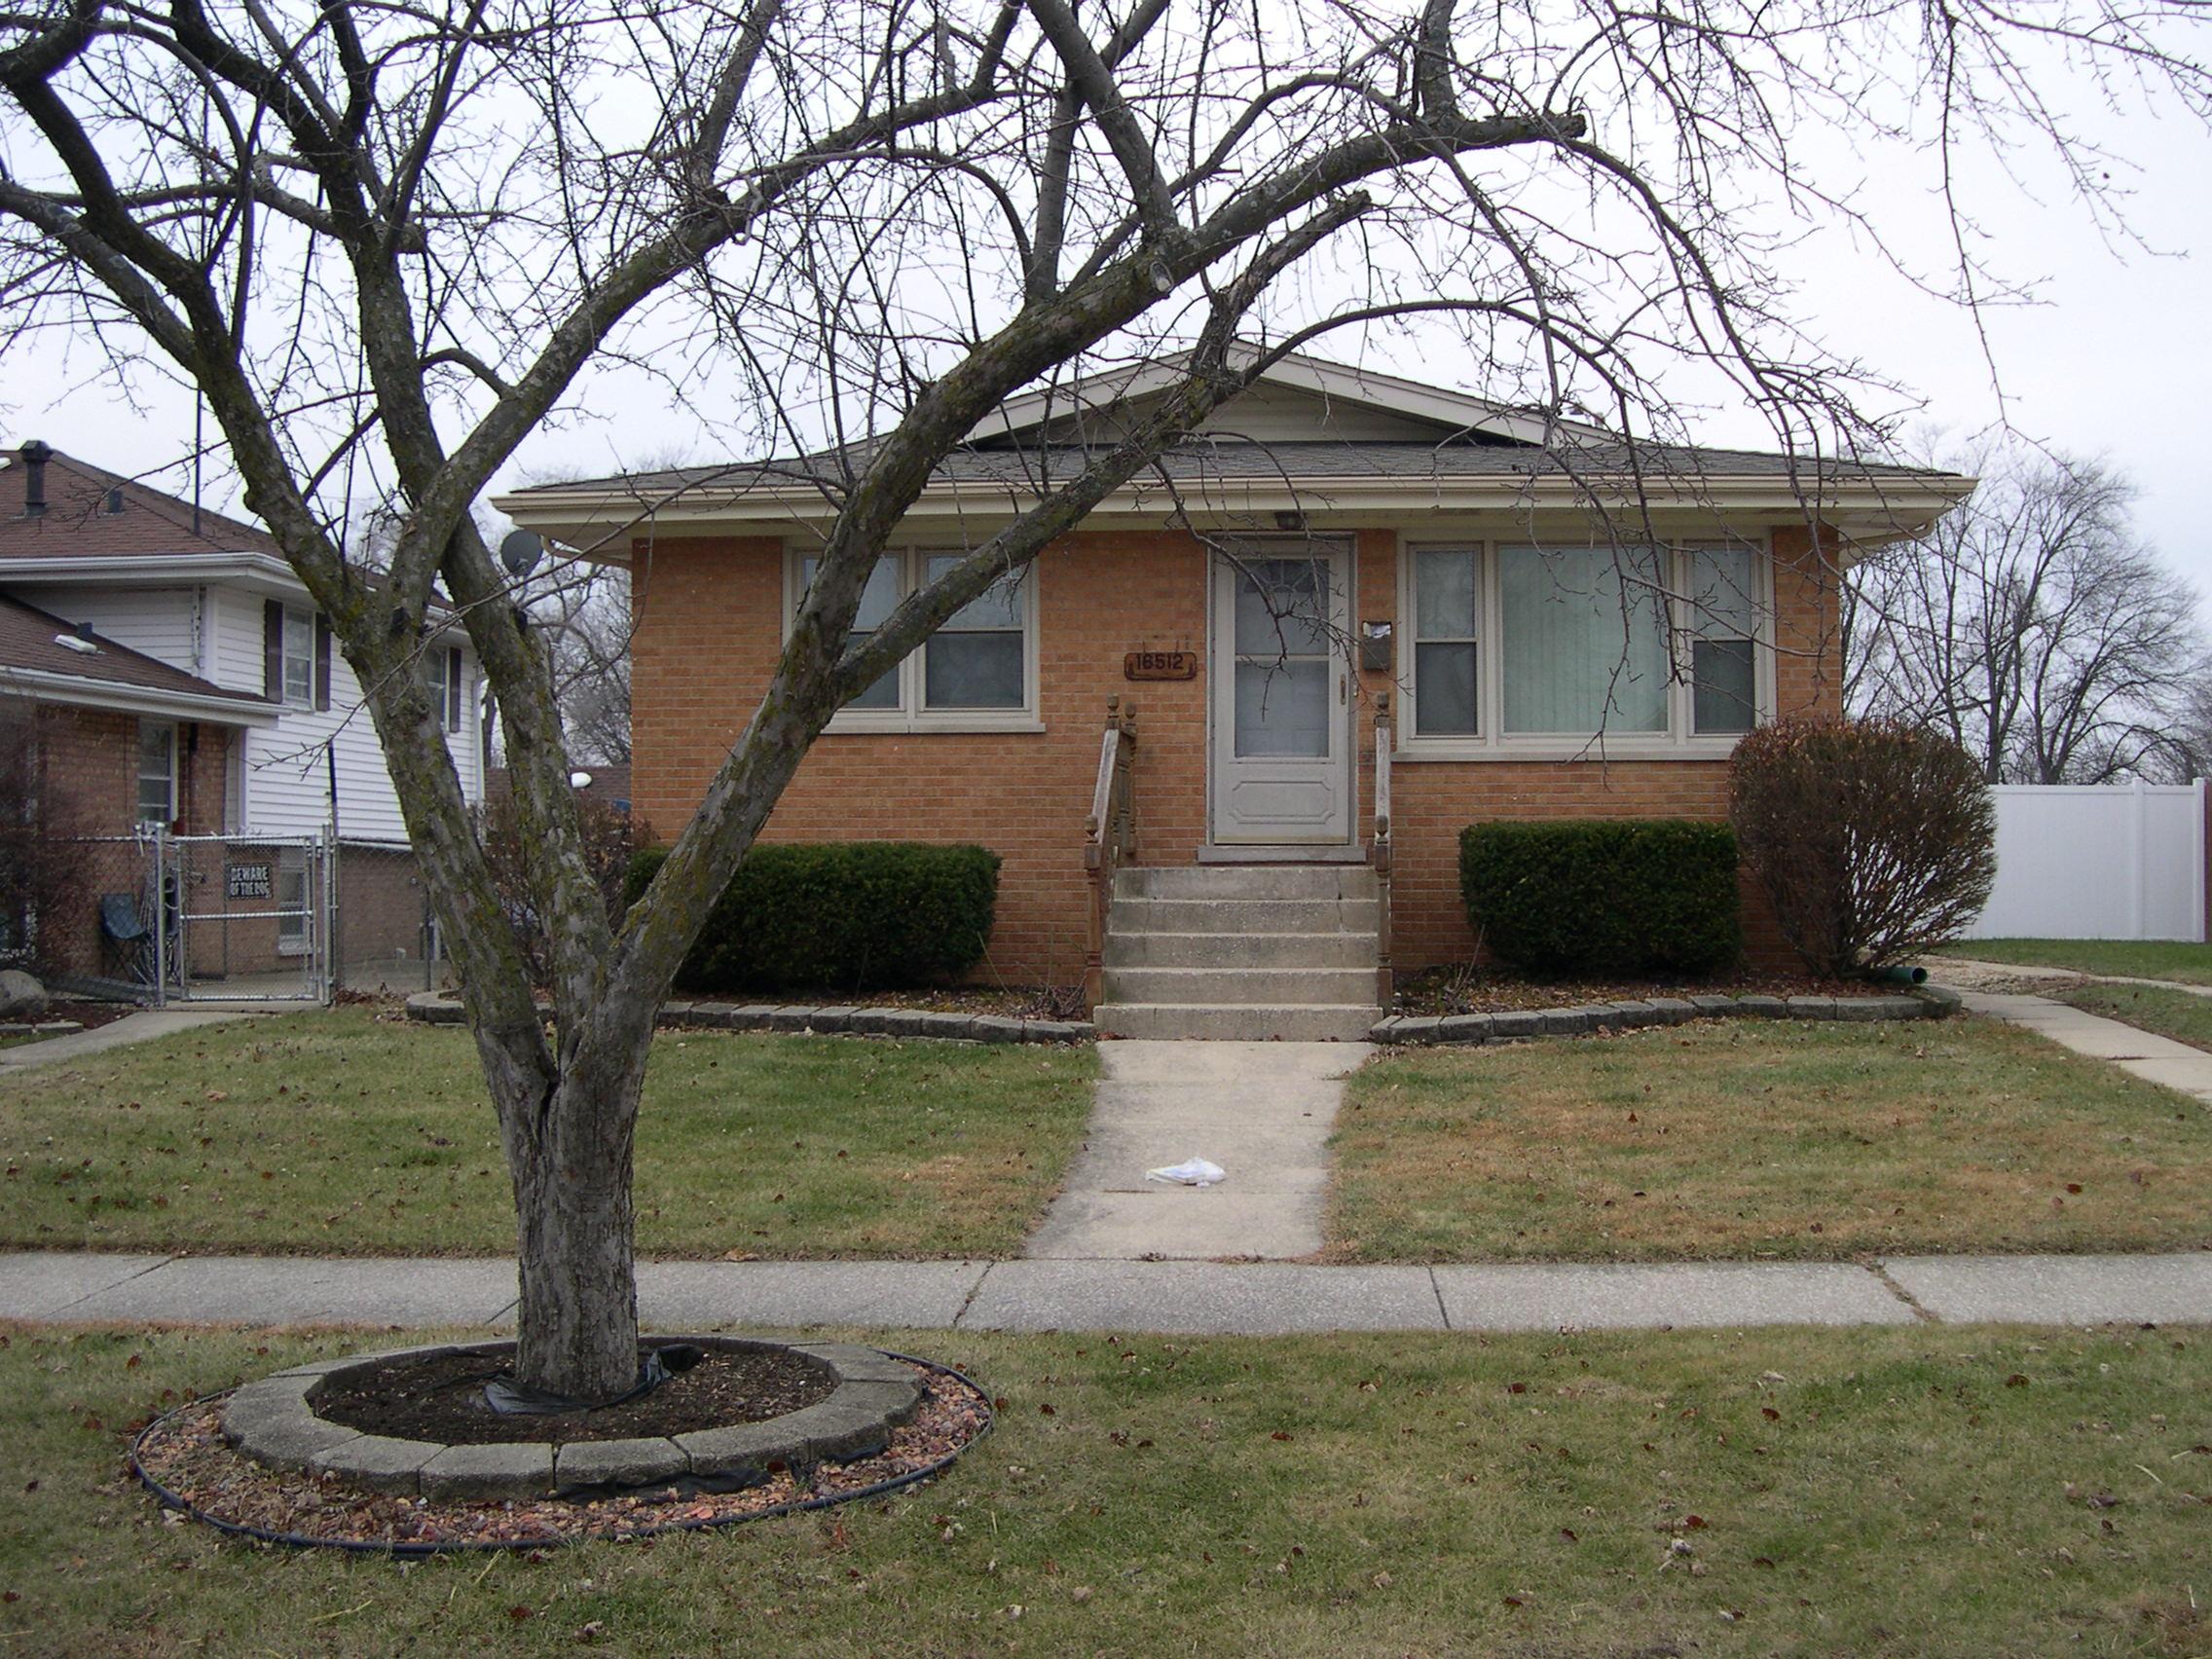 16512 67th Ct, Tinley Park, IL 60477